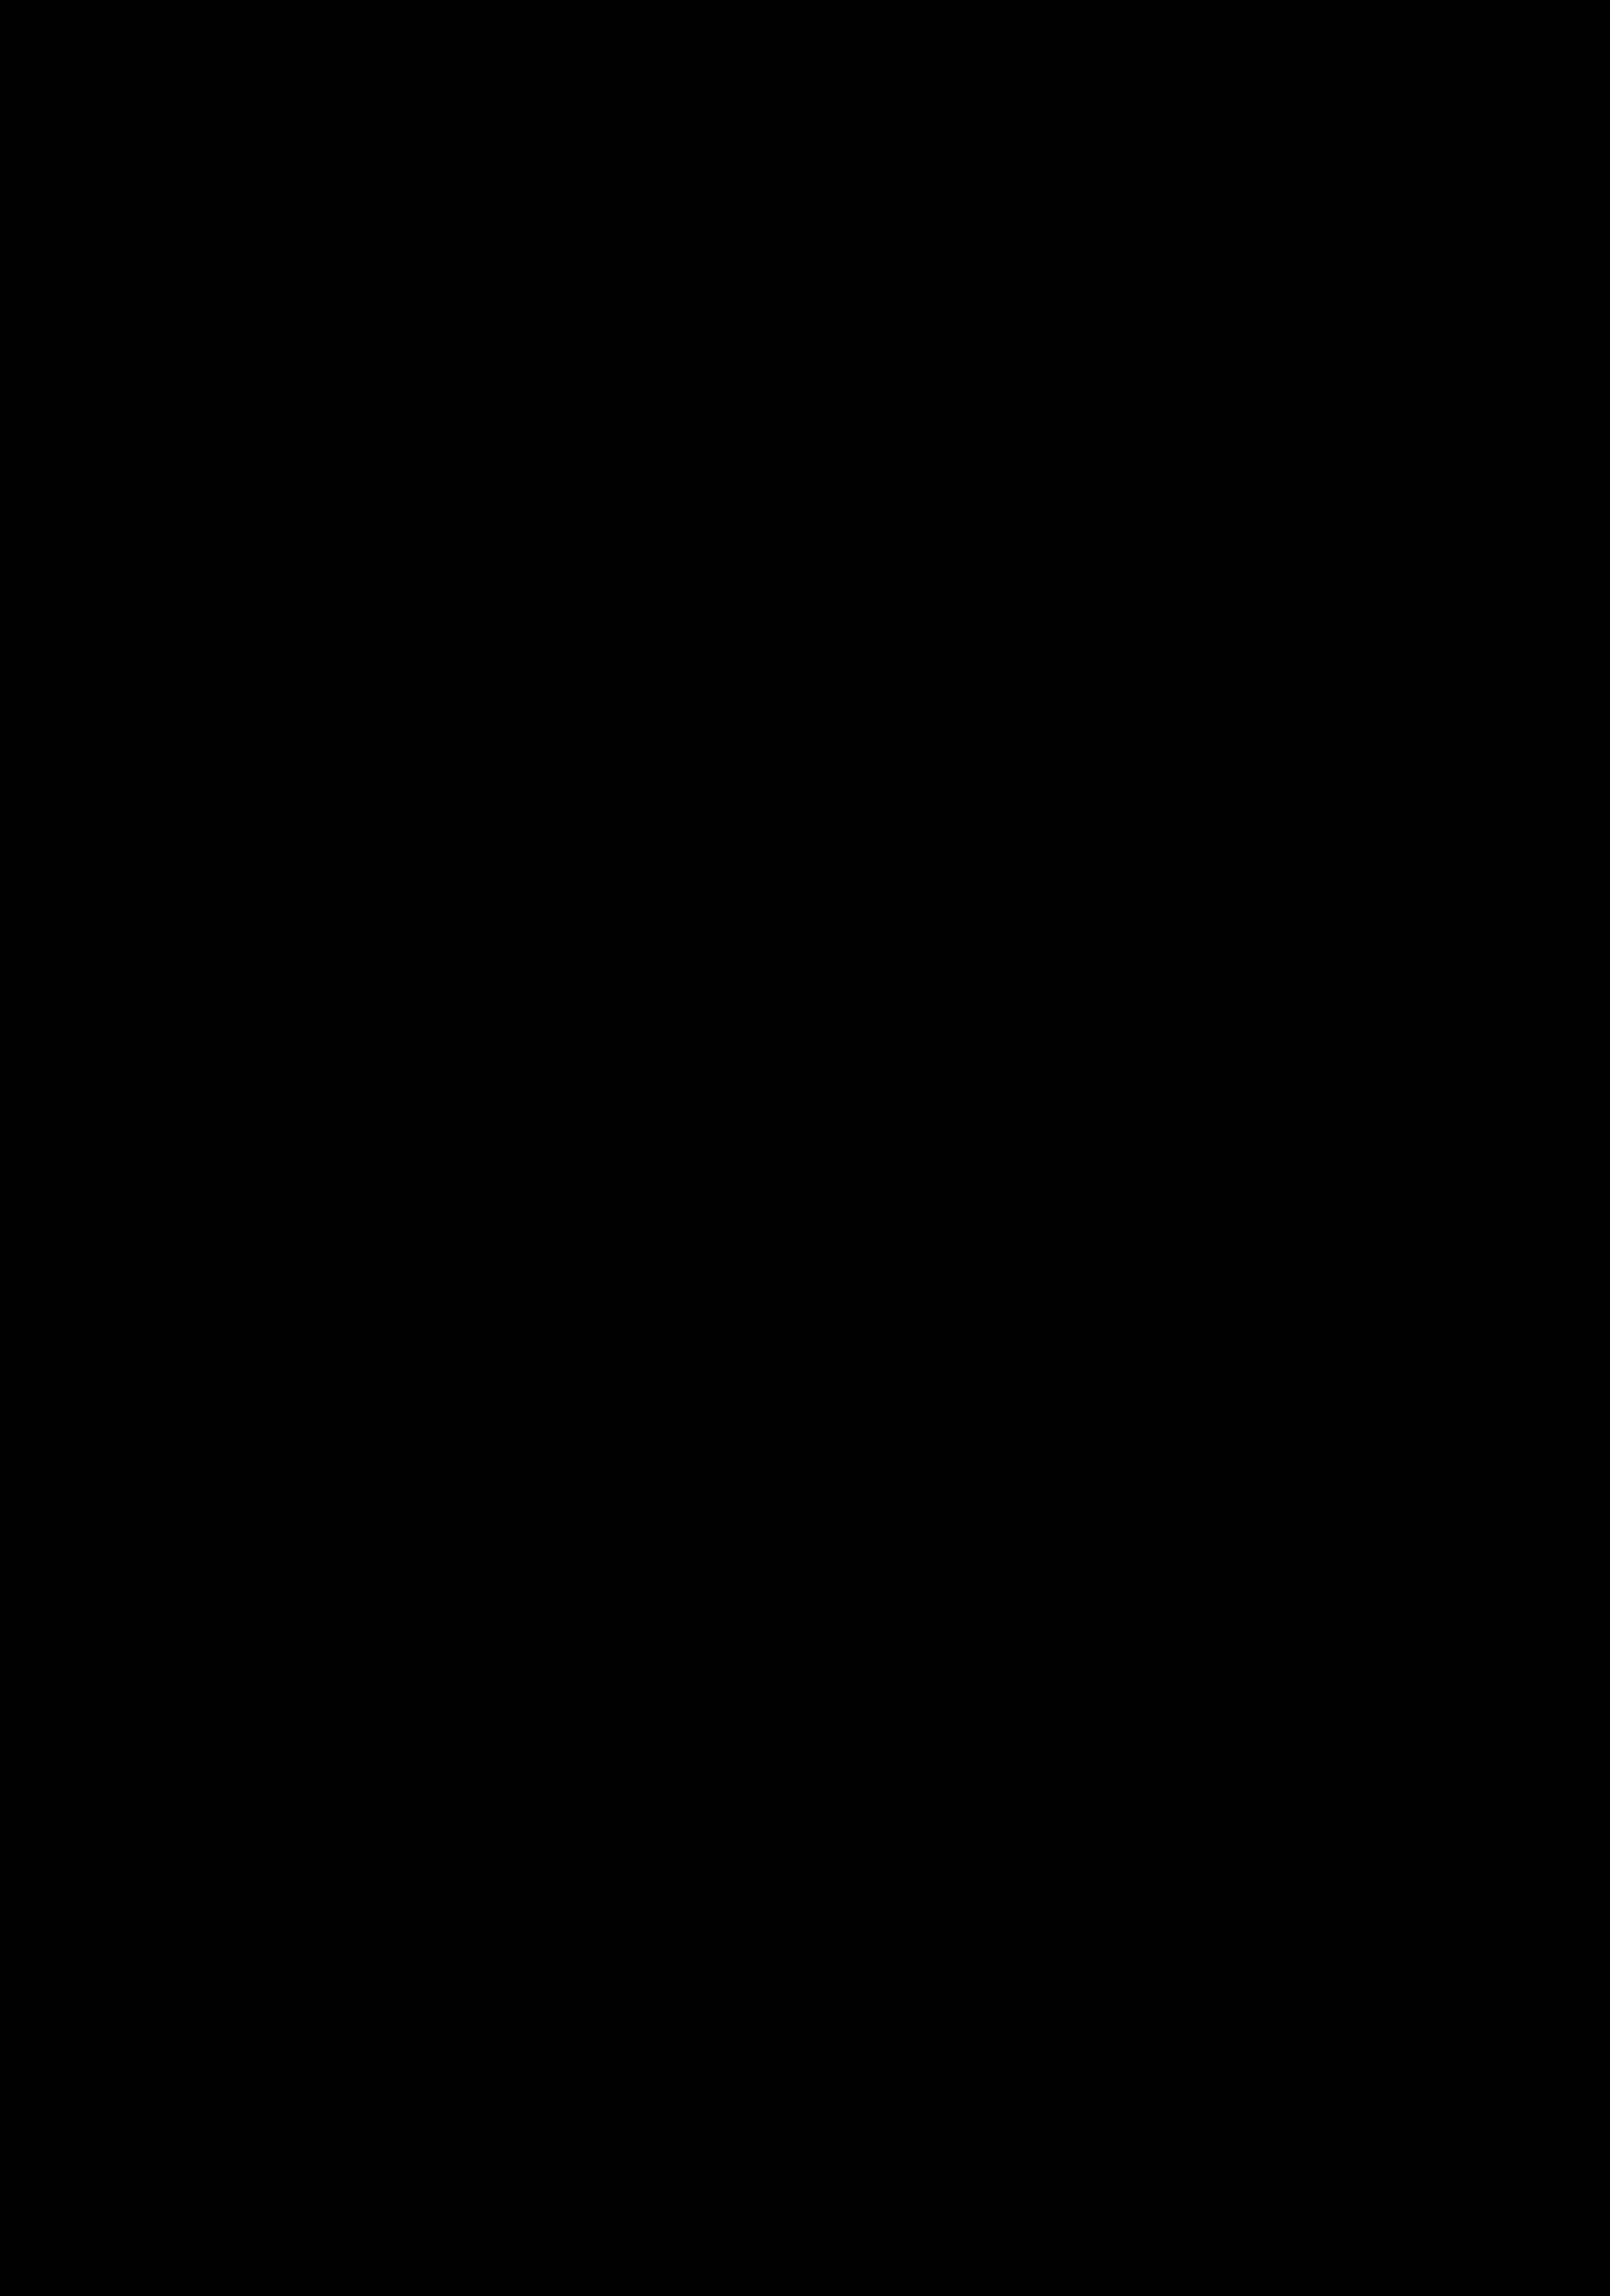 Box Of Crayons Sketch Vector Clipart Image